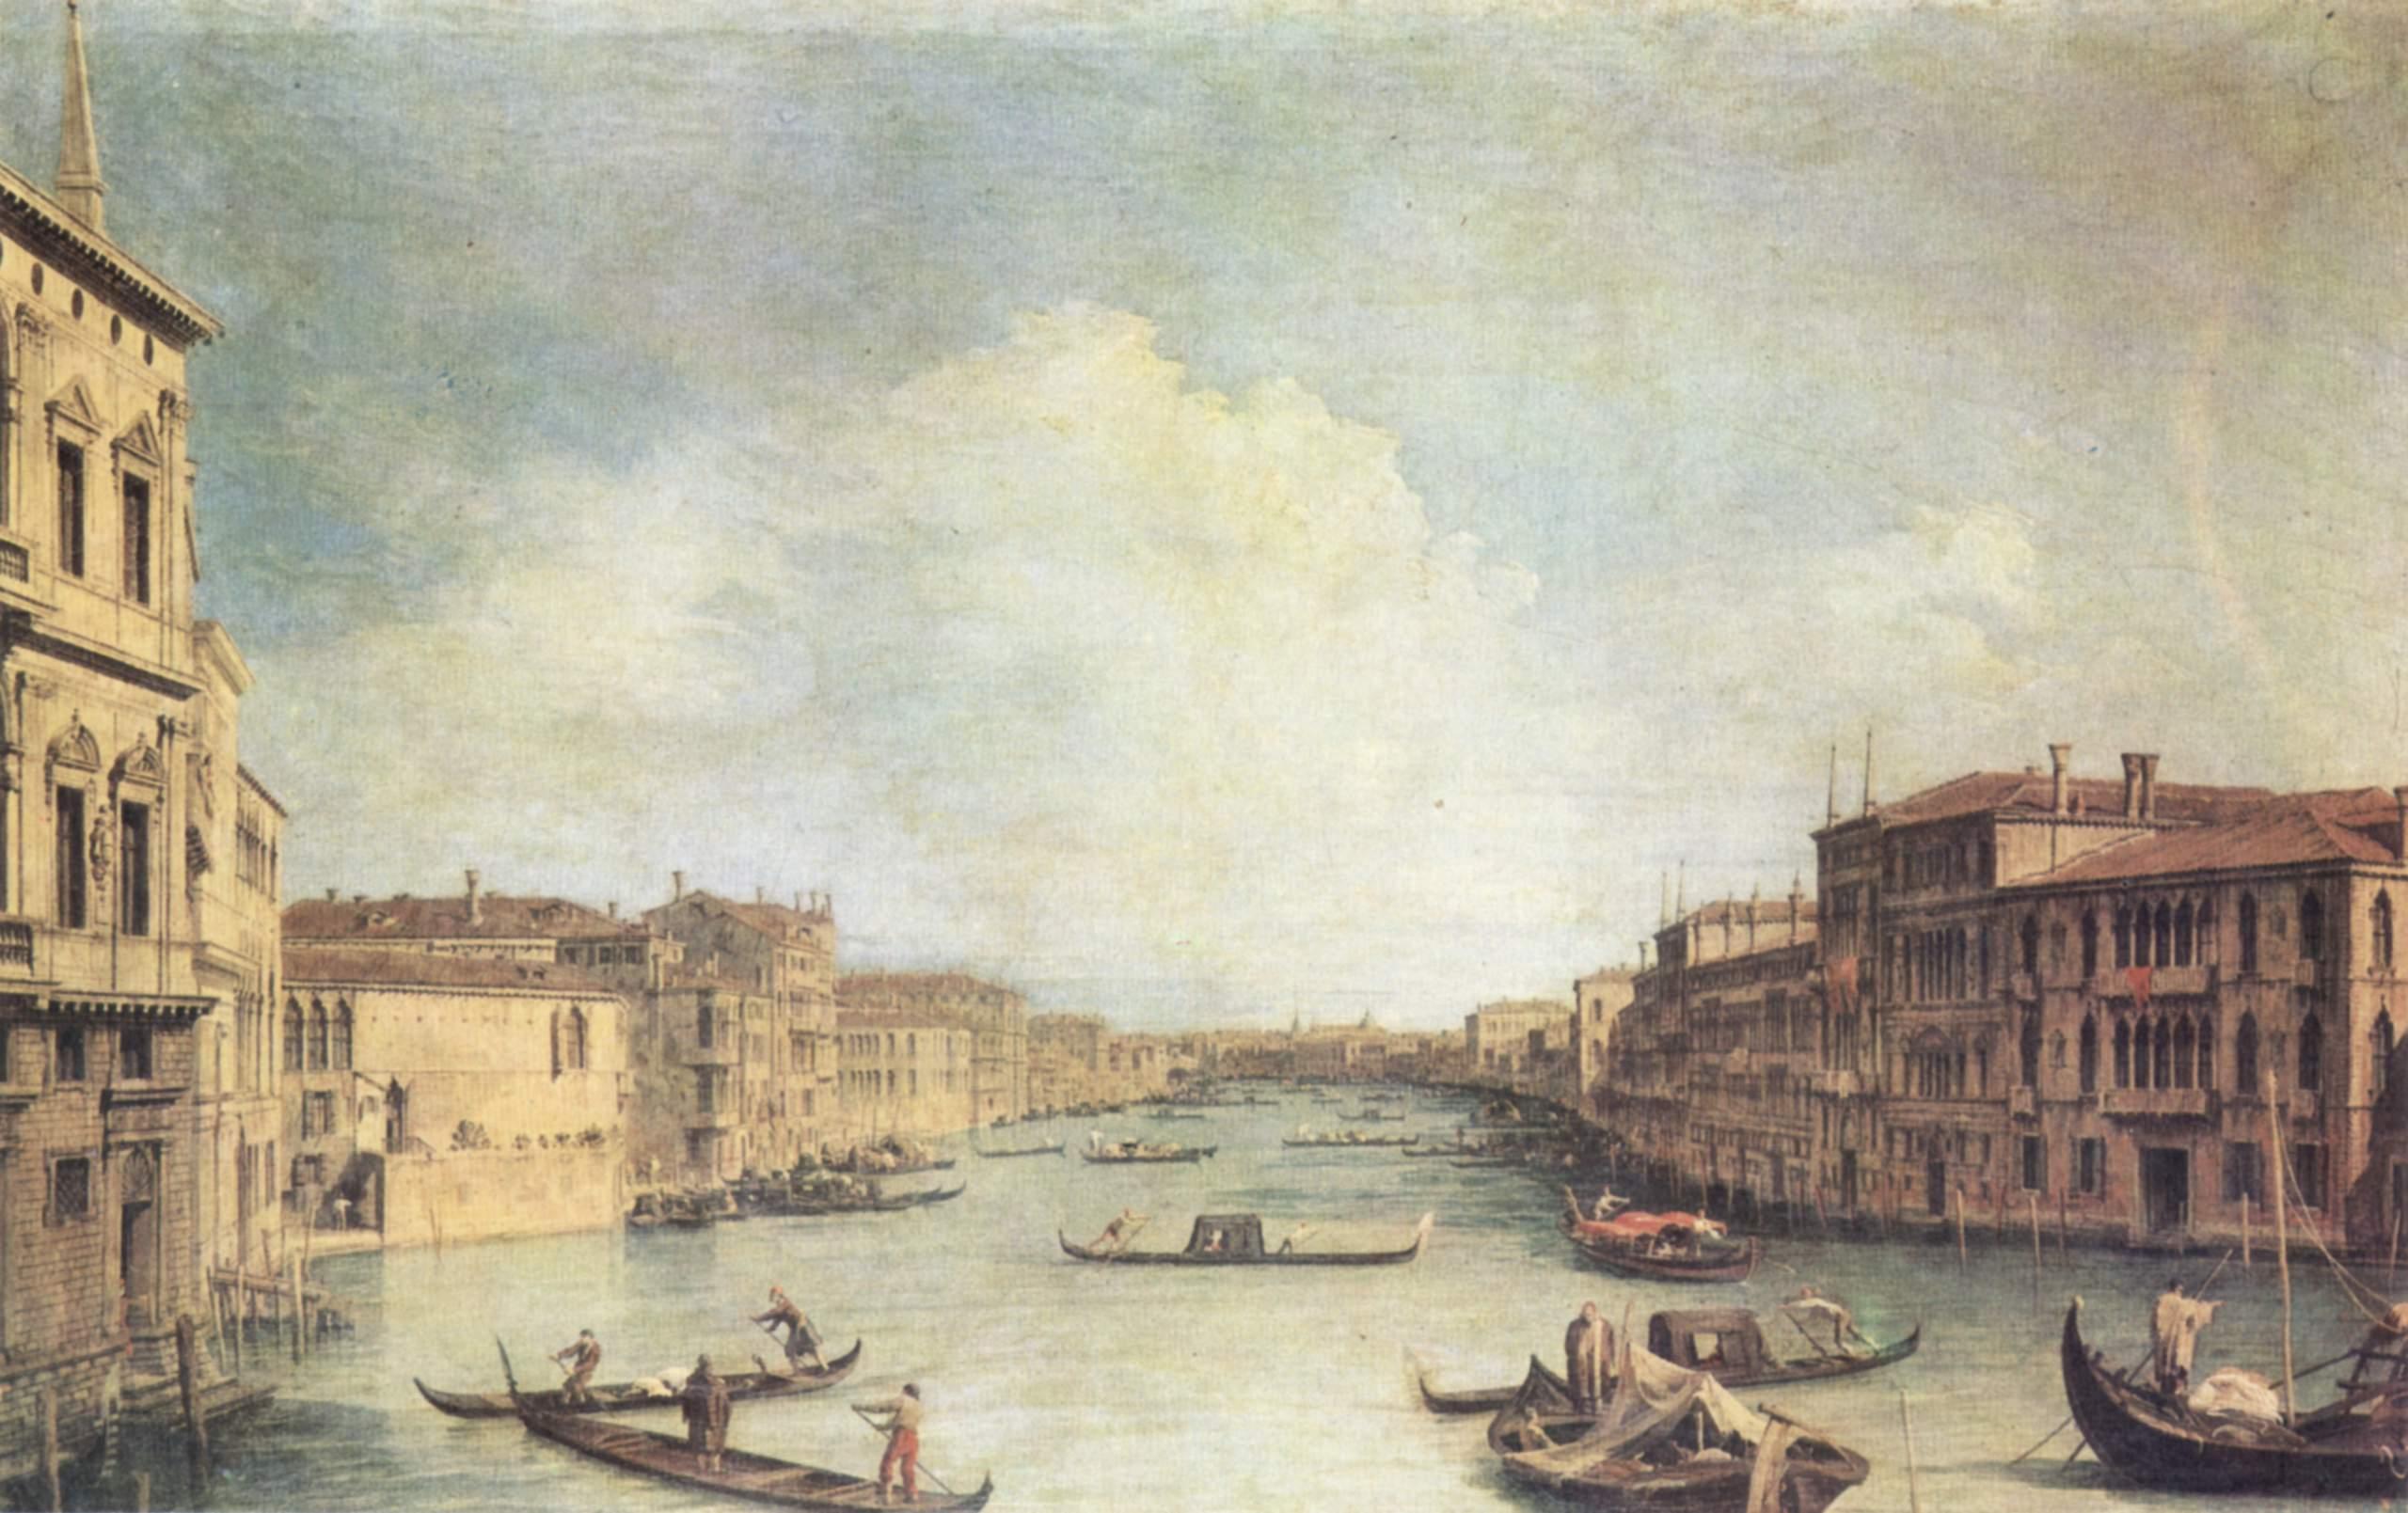 http://upload.wikimedia.org/wikipedia/commons/4/41/Canaletto_%28II%29_011.jpg